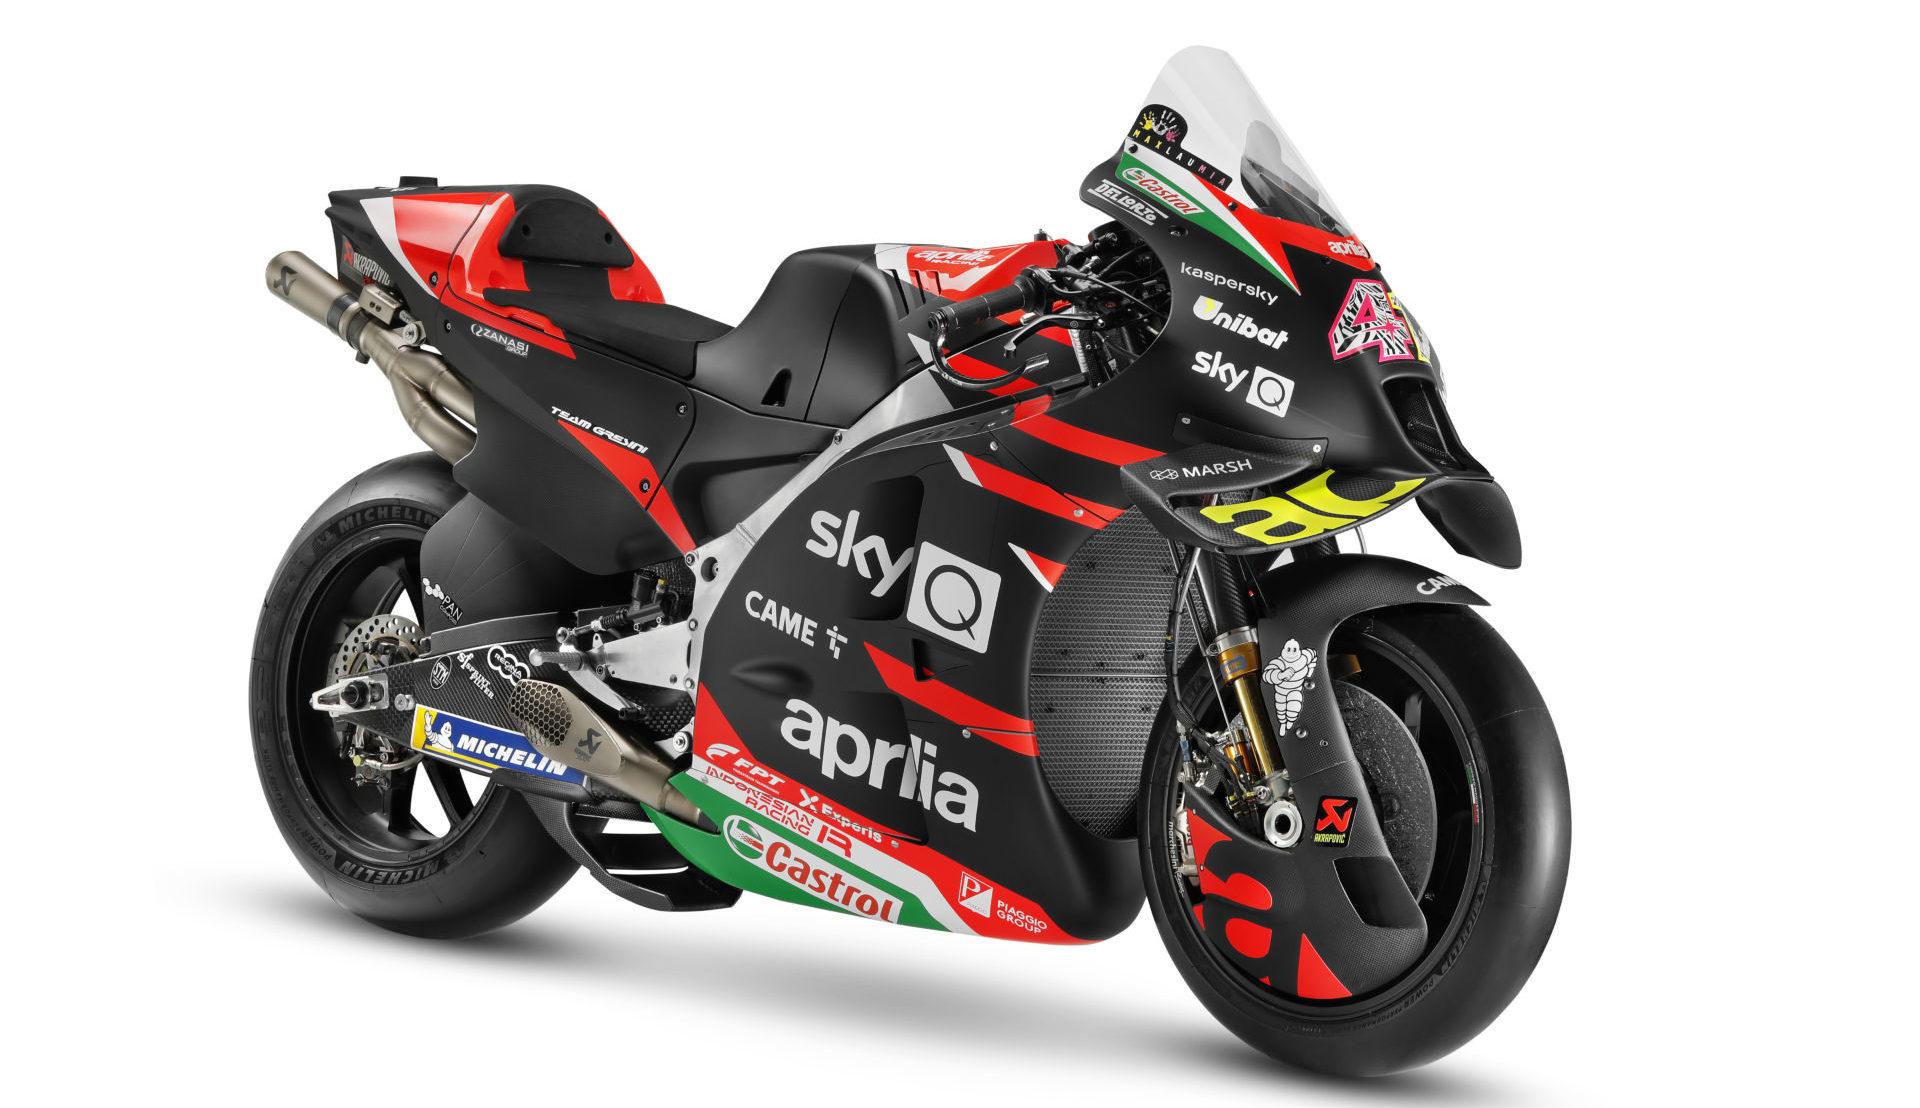 Aleix Espargaro's 2021 Aprilia RS-GP MotoGP racebike. Photo courtesy Aprilia.